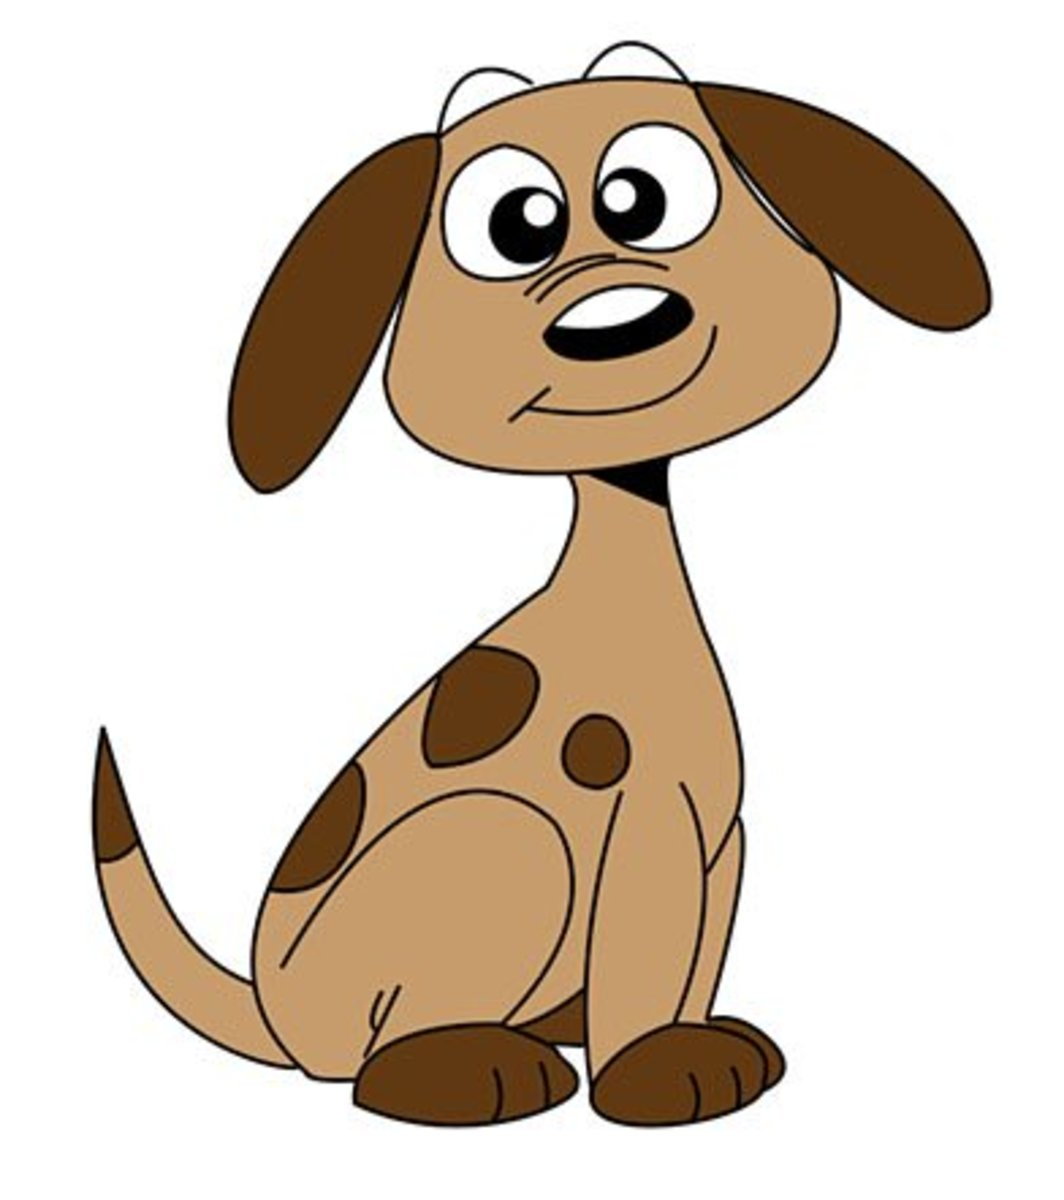 Drawing a Cartoon Dog | FeltMagnet